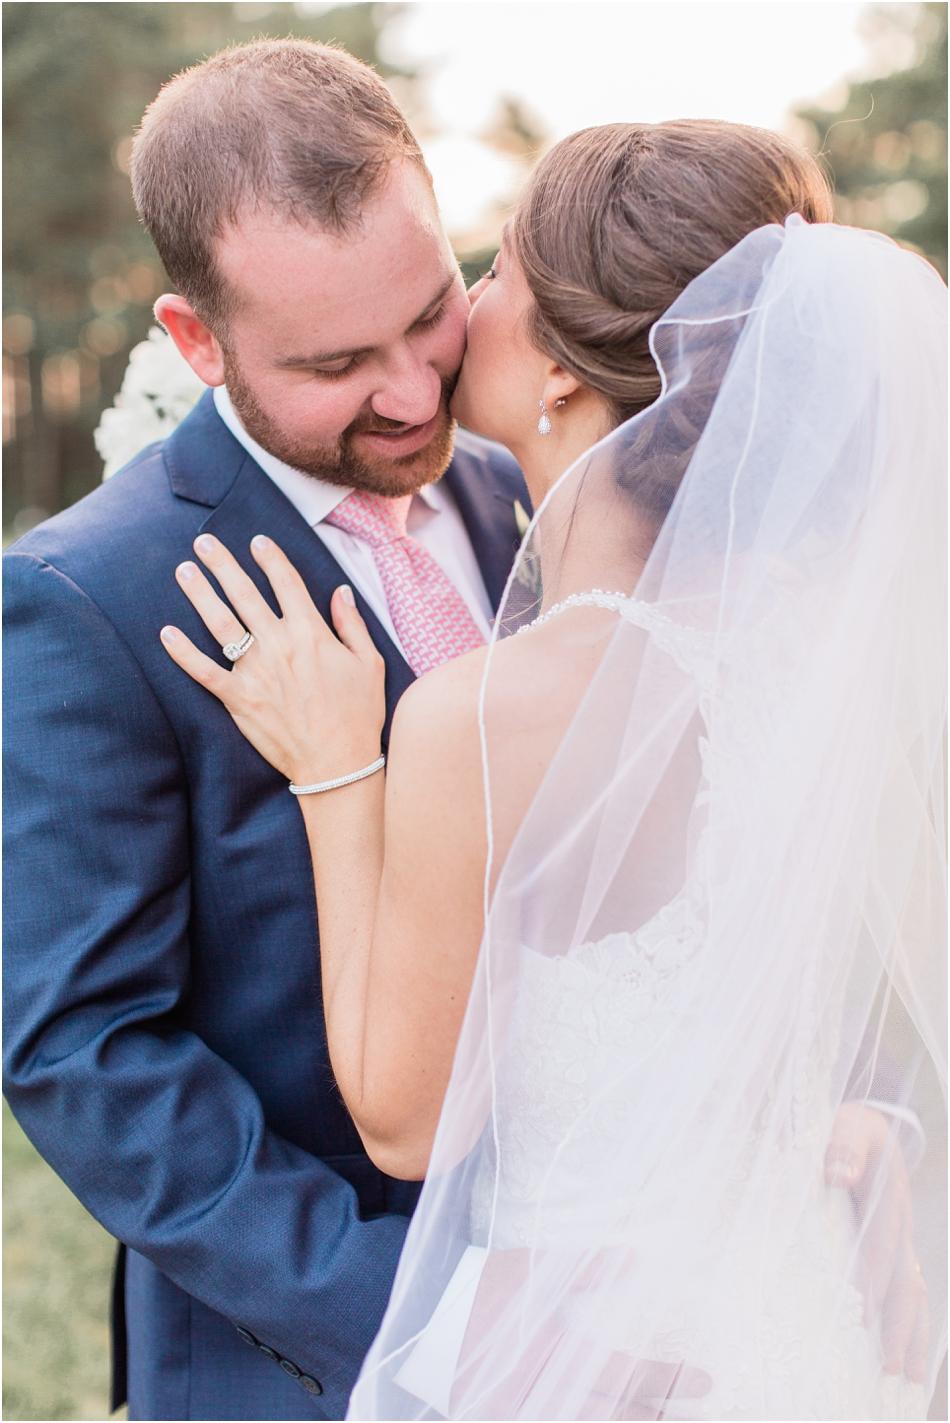 pine_hills_mirbeau_golf_club_boston_massachusetts_cape_cod_new_england_wedding_photographer_Meredith_Jane_Photography_photo_1722.jpg